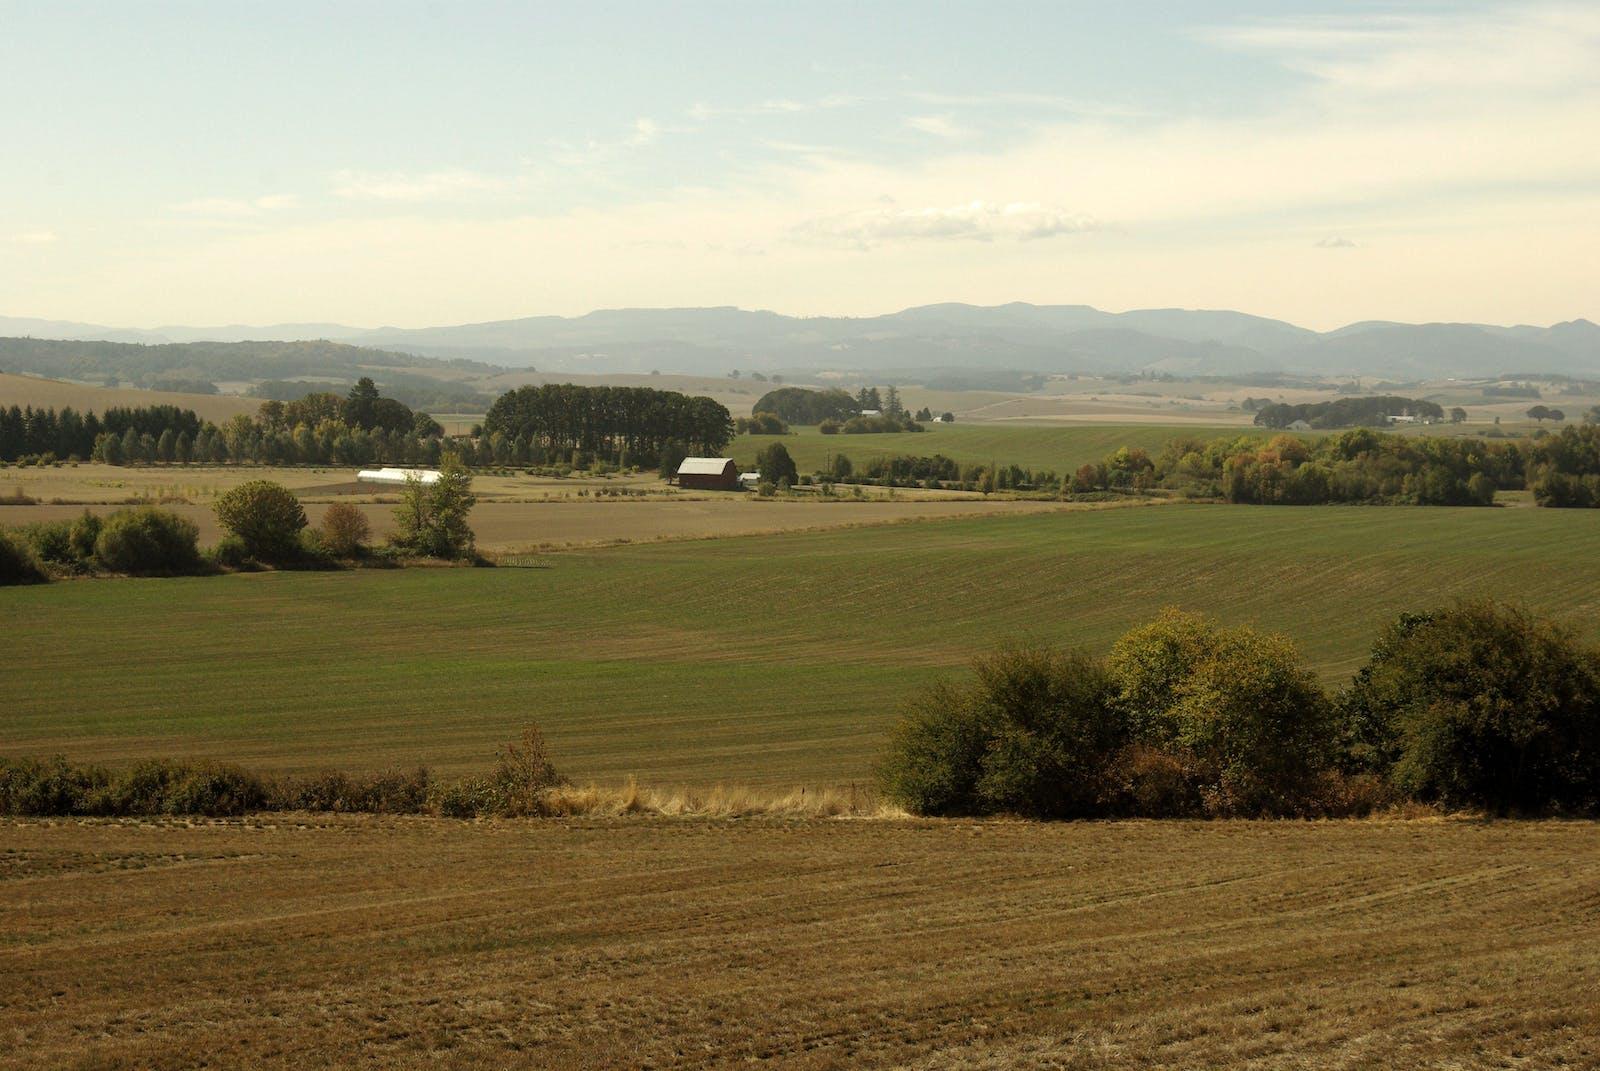 Willamette Valley Oak Savanna